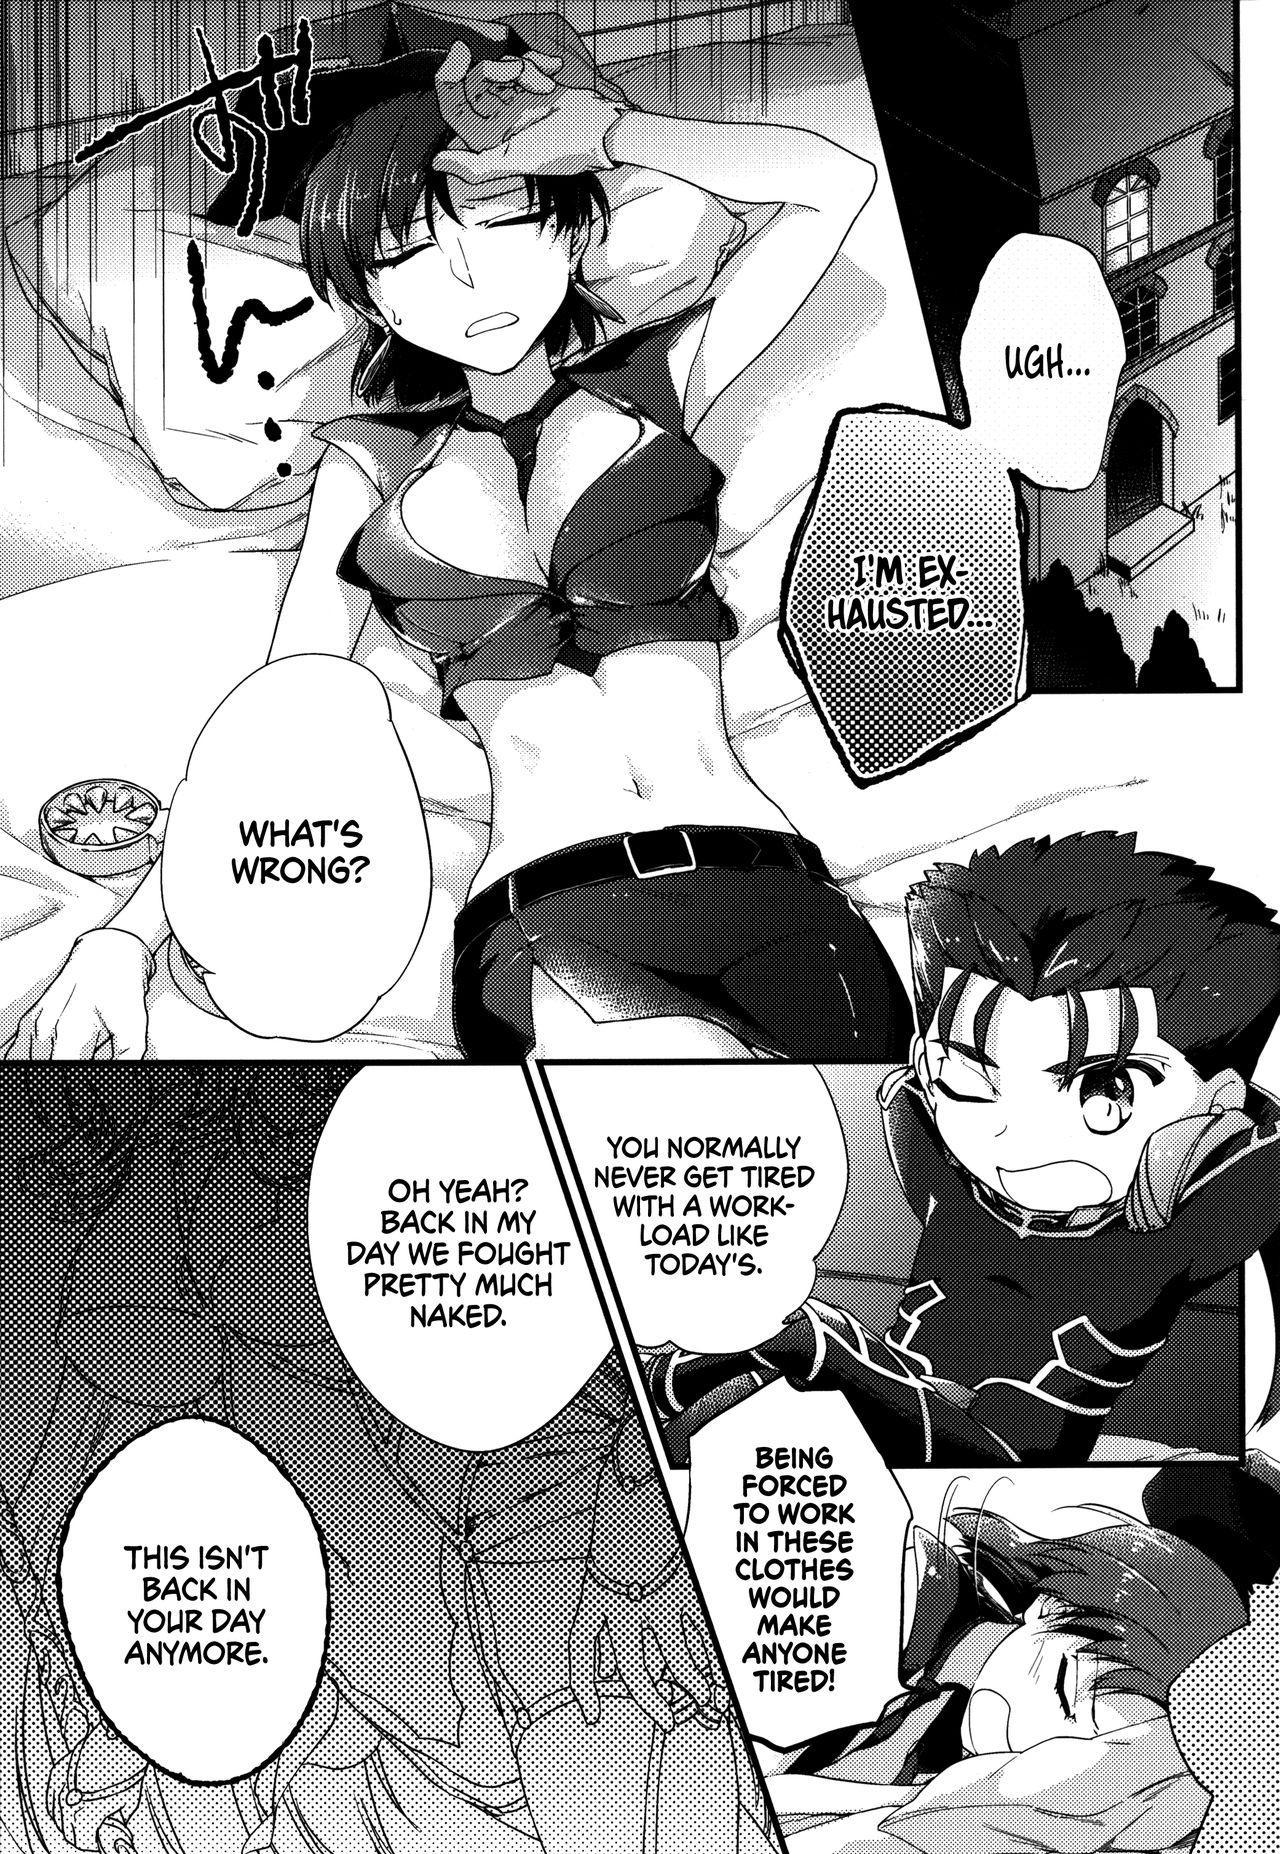 (C90) [Gokutsubushi (Misoiri)] Chiisai Lancer ga Bazett-san node Ookiku Naru | Little Lancer turns huge because of Bazett-san (Fate/hollow Ataraxia) [English] [EHCOVE] 2